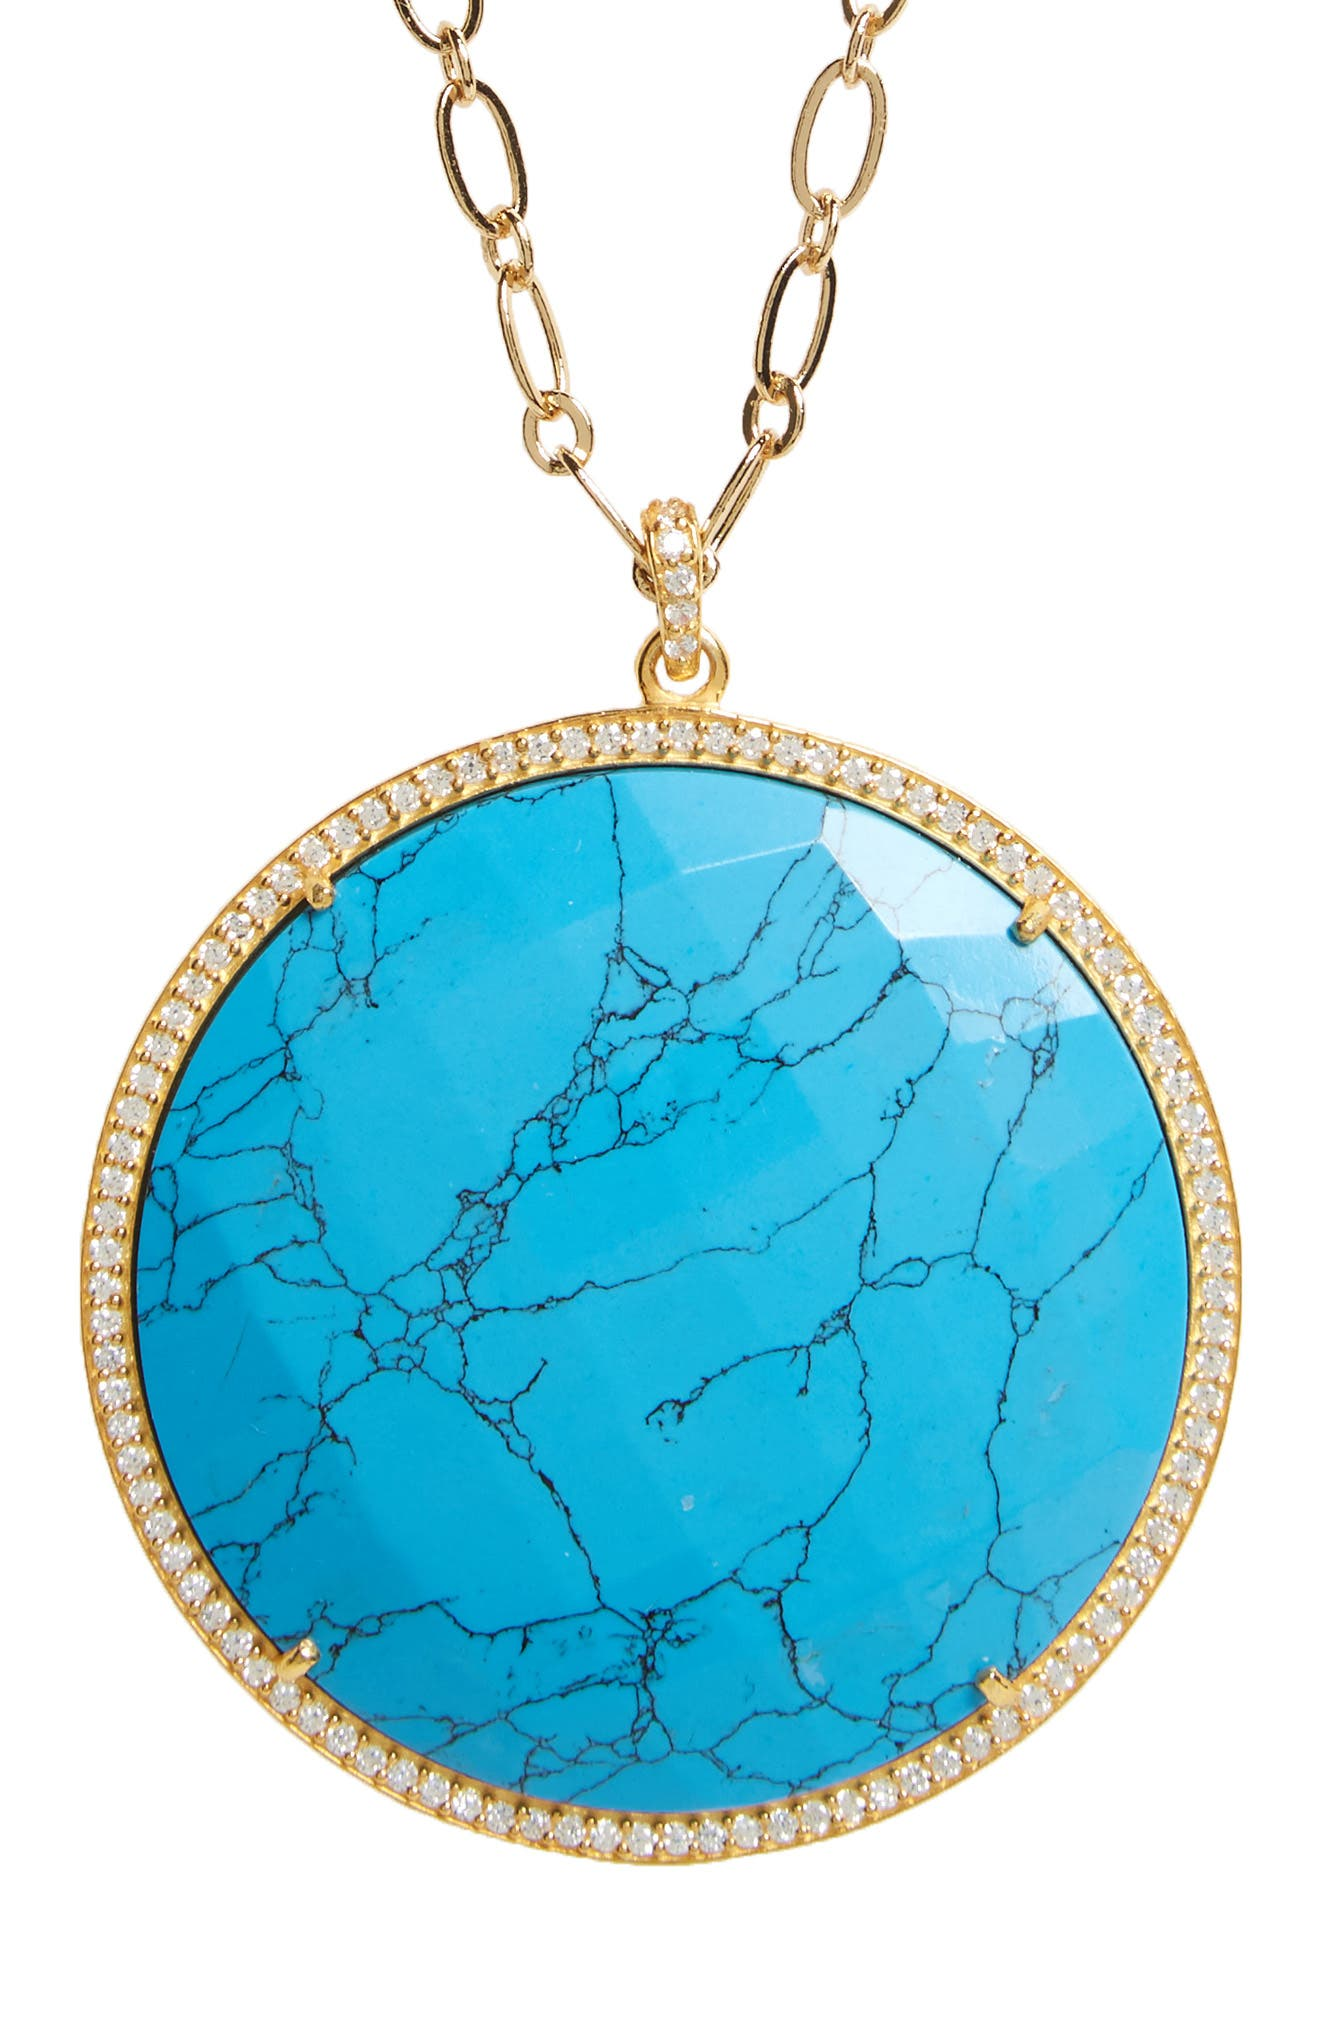 Main Image - Susan Hanover Large Semiprecious Stone Pendant Necklace